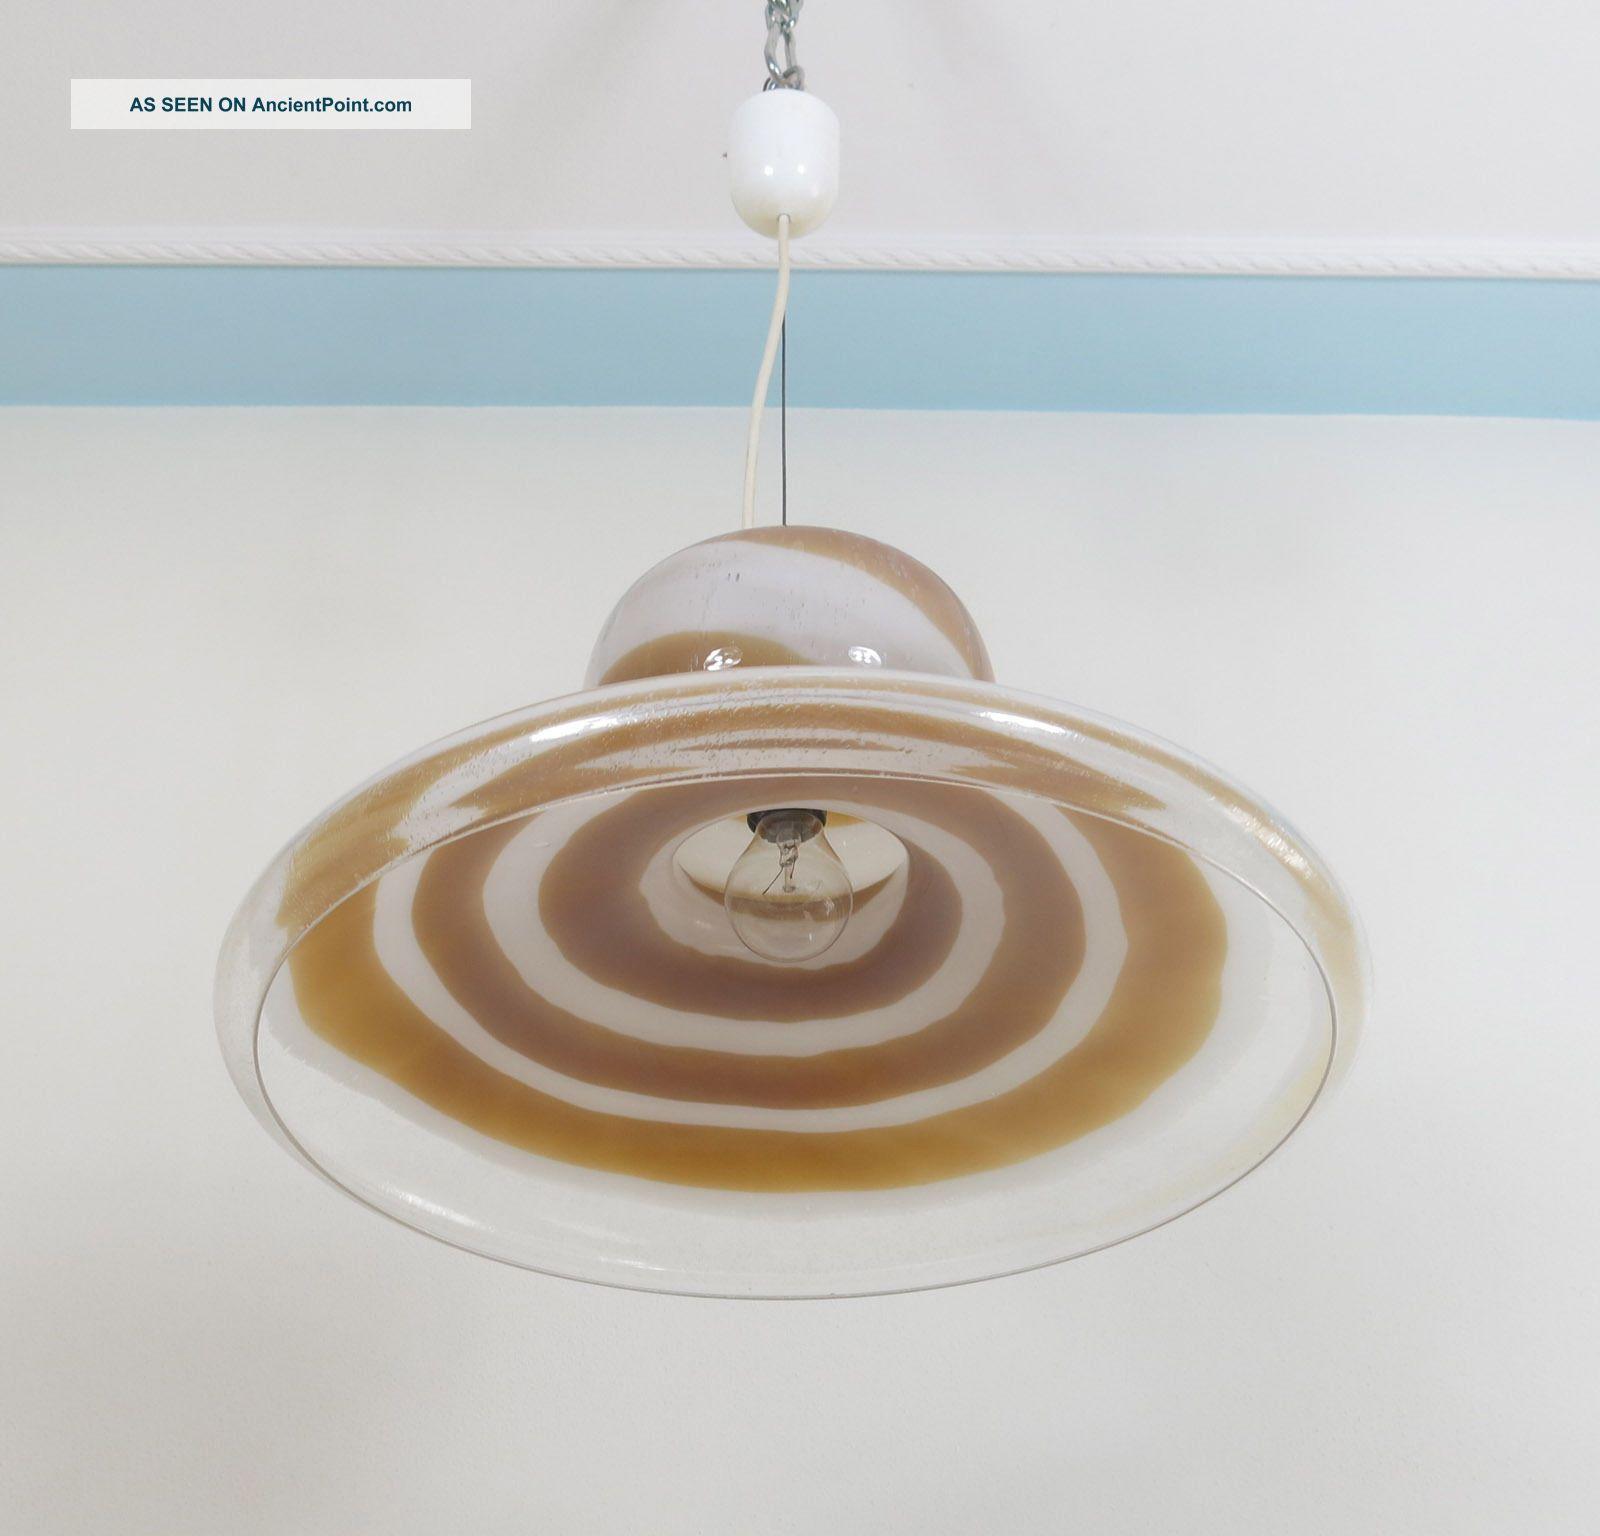 Italian Vintage Murano Pulegoso Glass Chandelier Lamp Mazzega Attrib.  - Nason Era Mid-Century Modernism photo